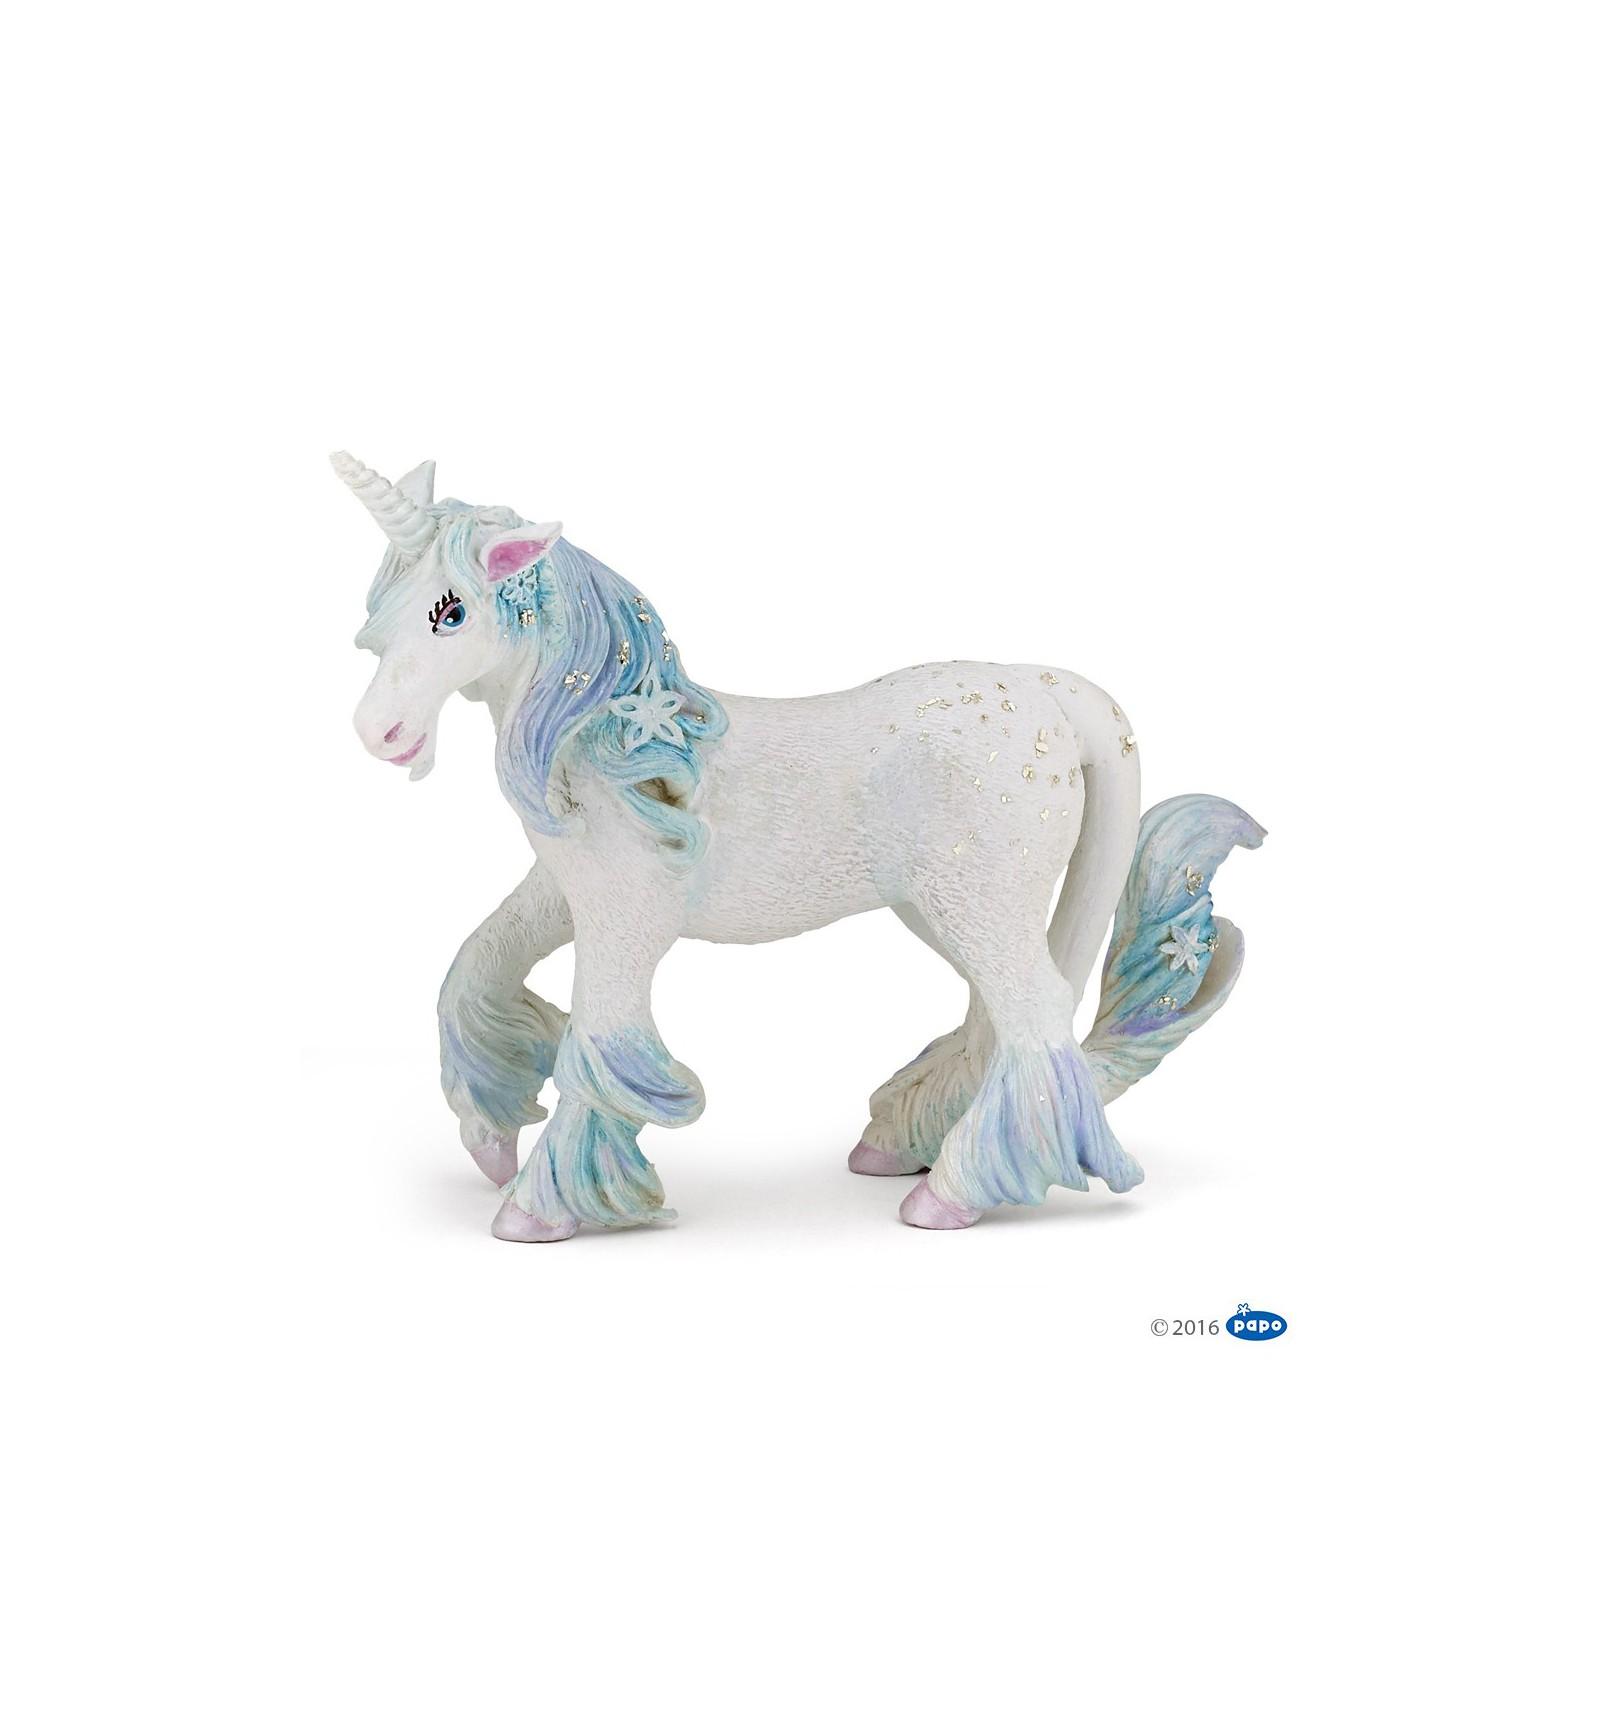 Papo Figure Toys New Enchanted Fairy Unicorn